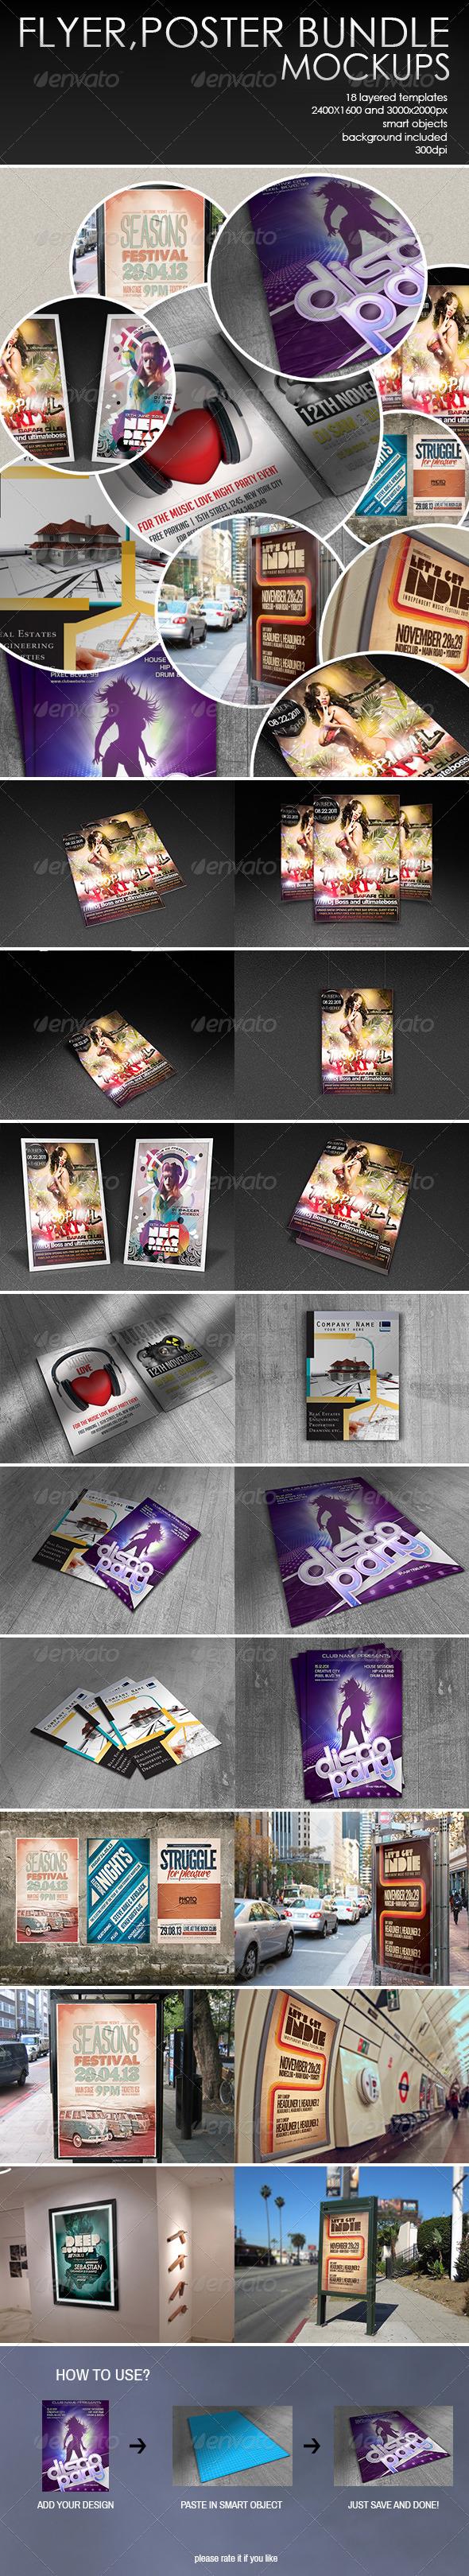 GraphicRiver Flyer Poster Bundle 7721745